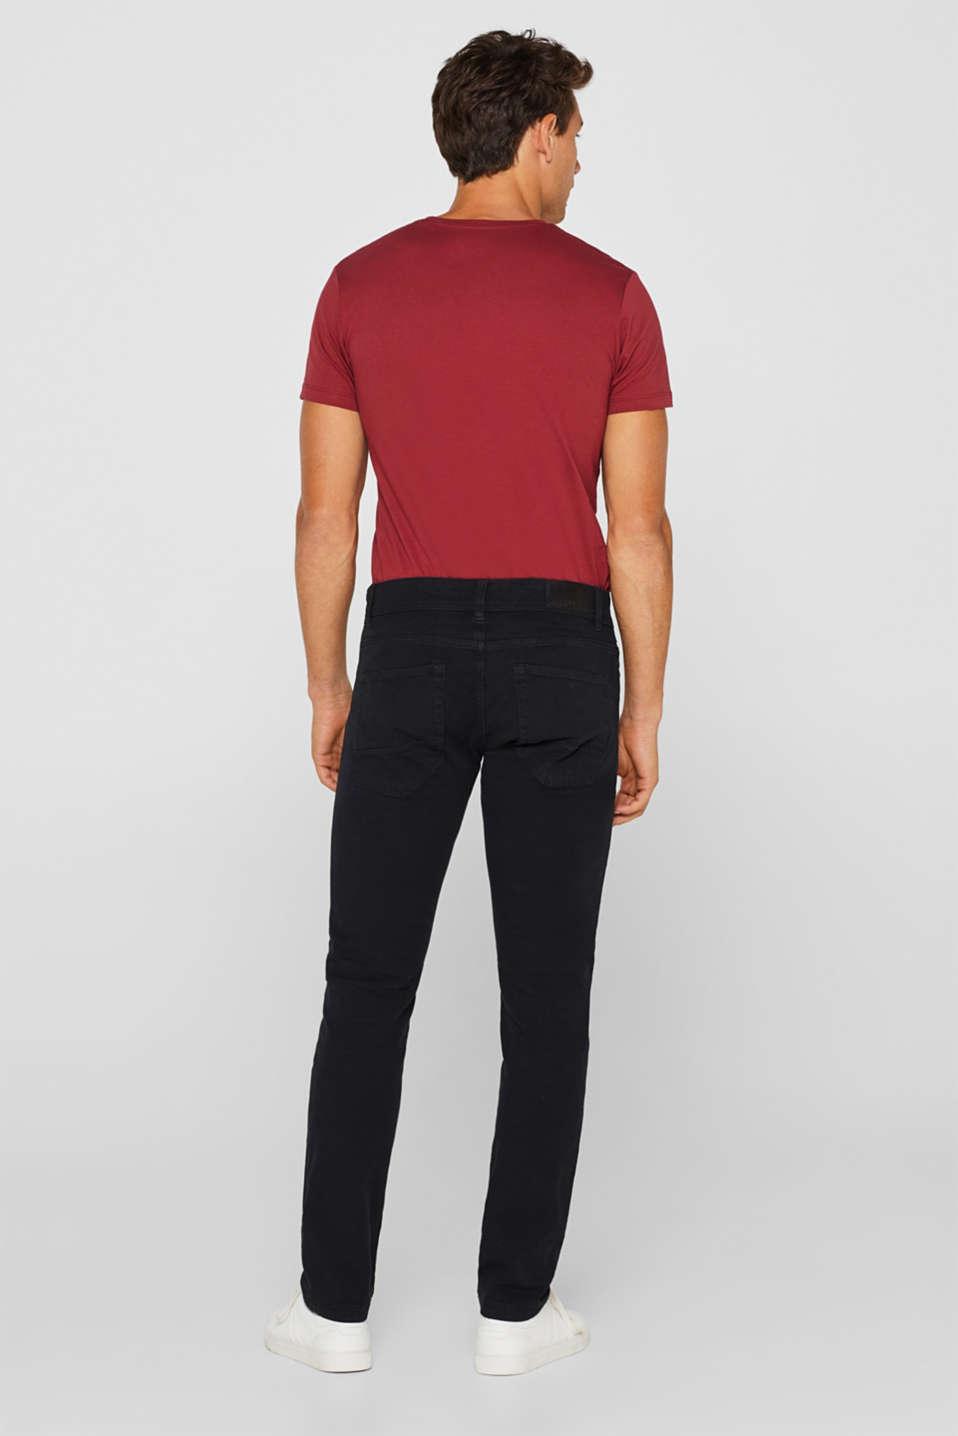 Pants woven Slim fit, BLACK, detail image number 3